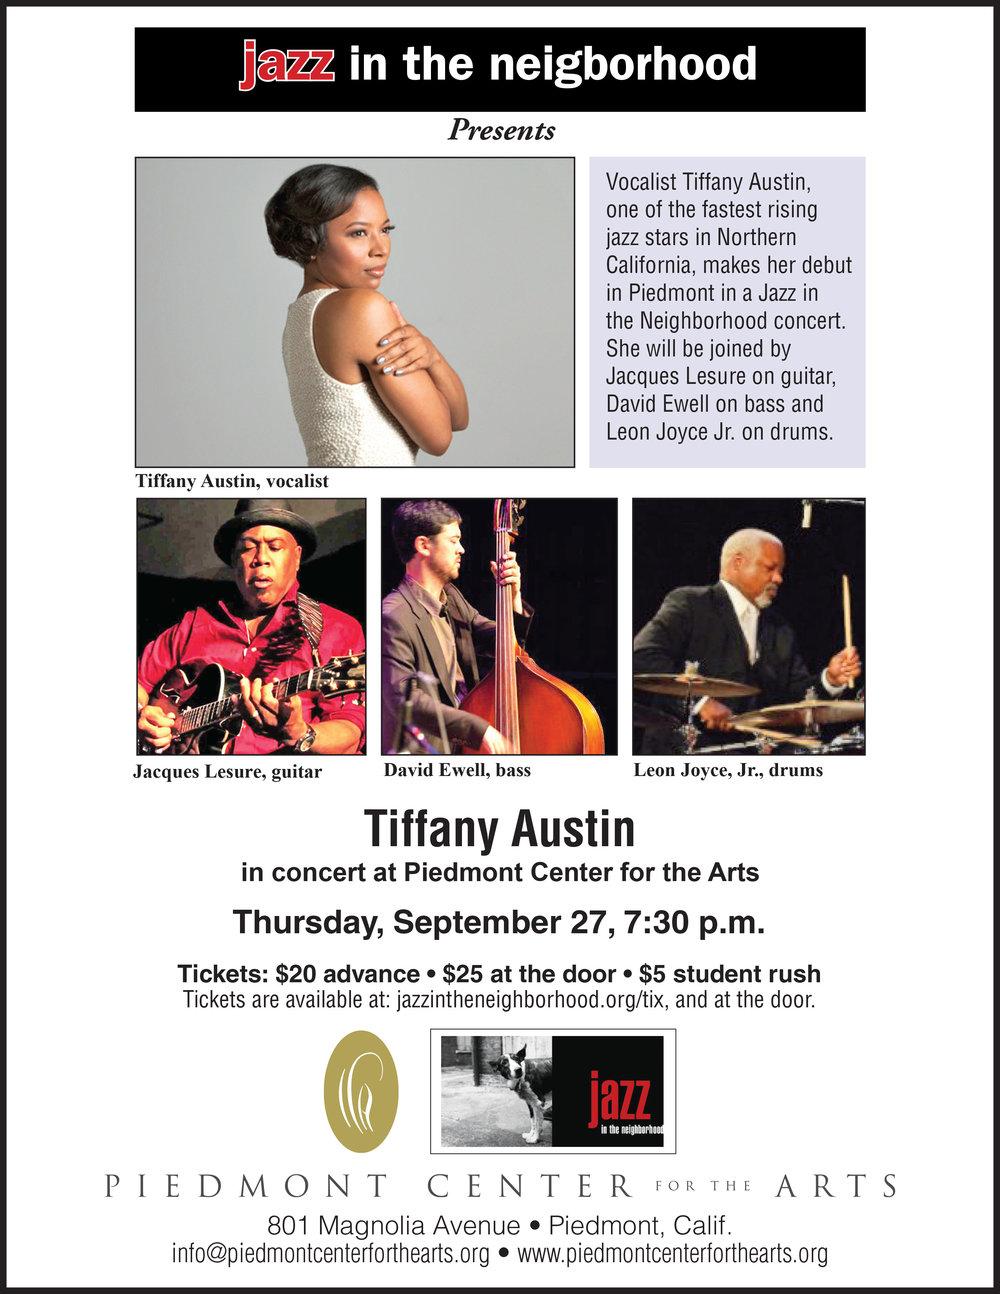 Jazz in the Neighborhood Opens it's Fourth Season on Sept. 27